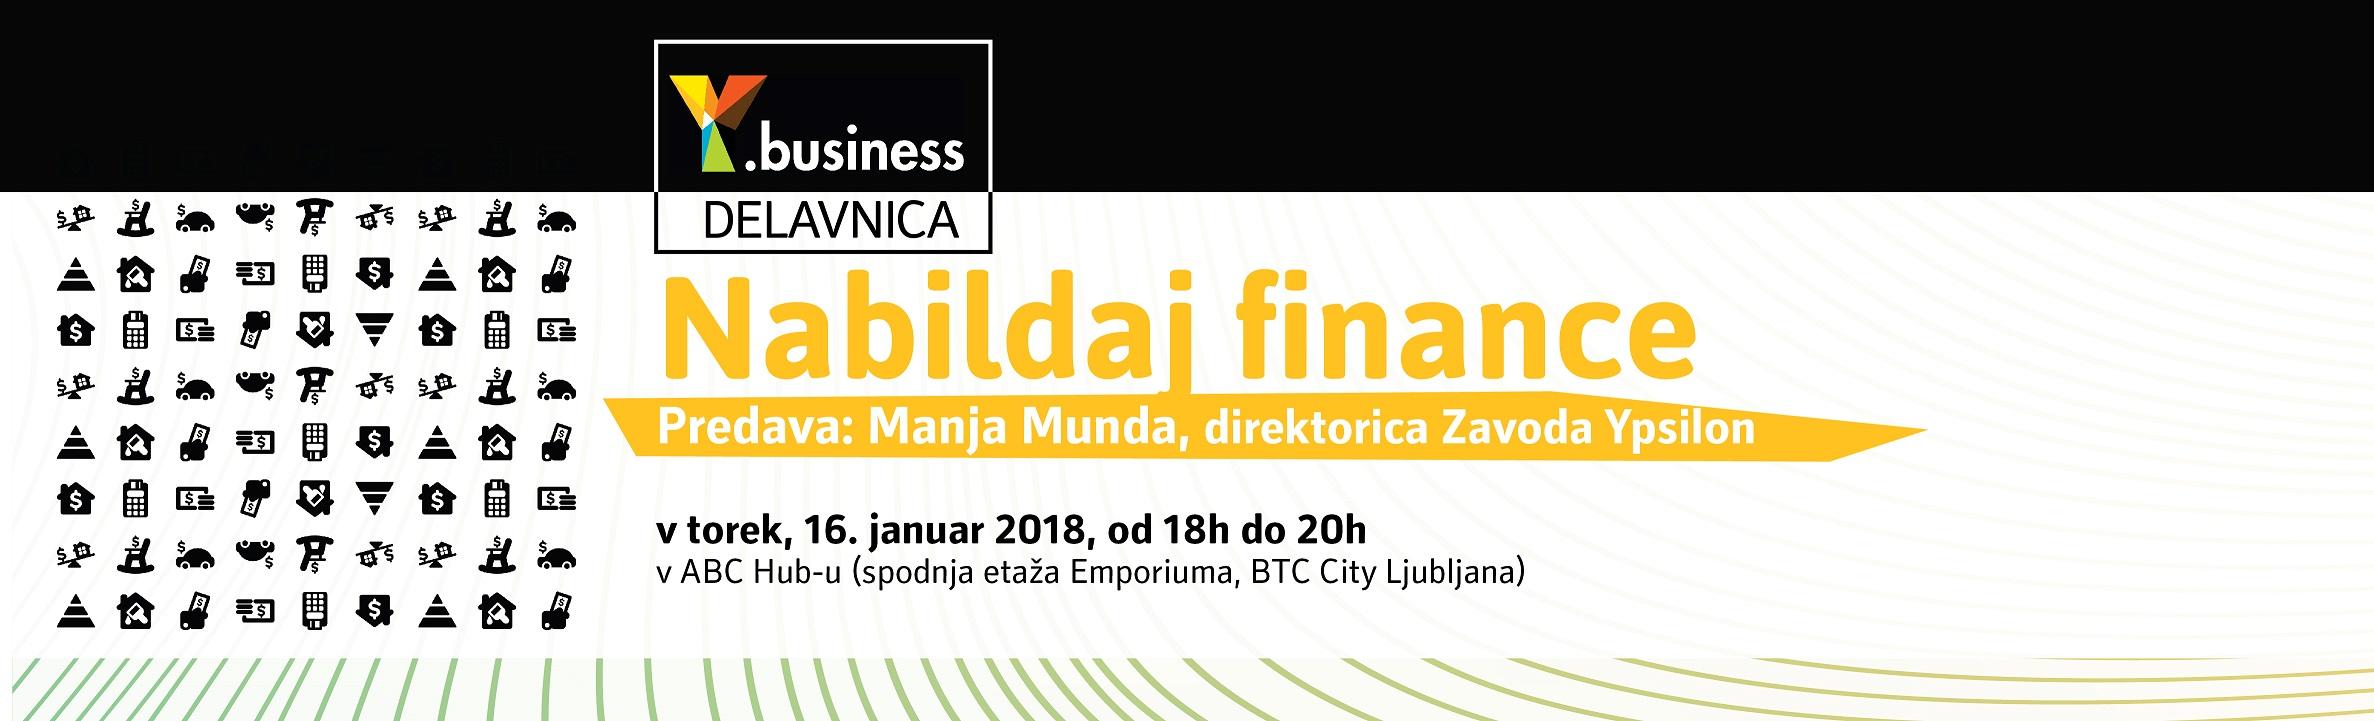 Ybusiness Nabildaj Finance Januar 2018 small